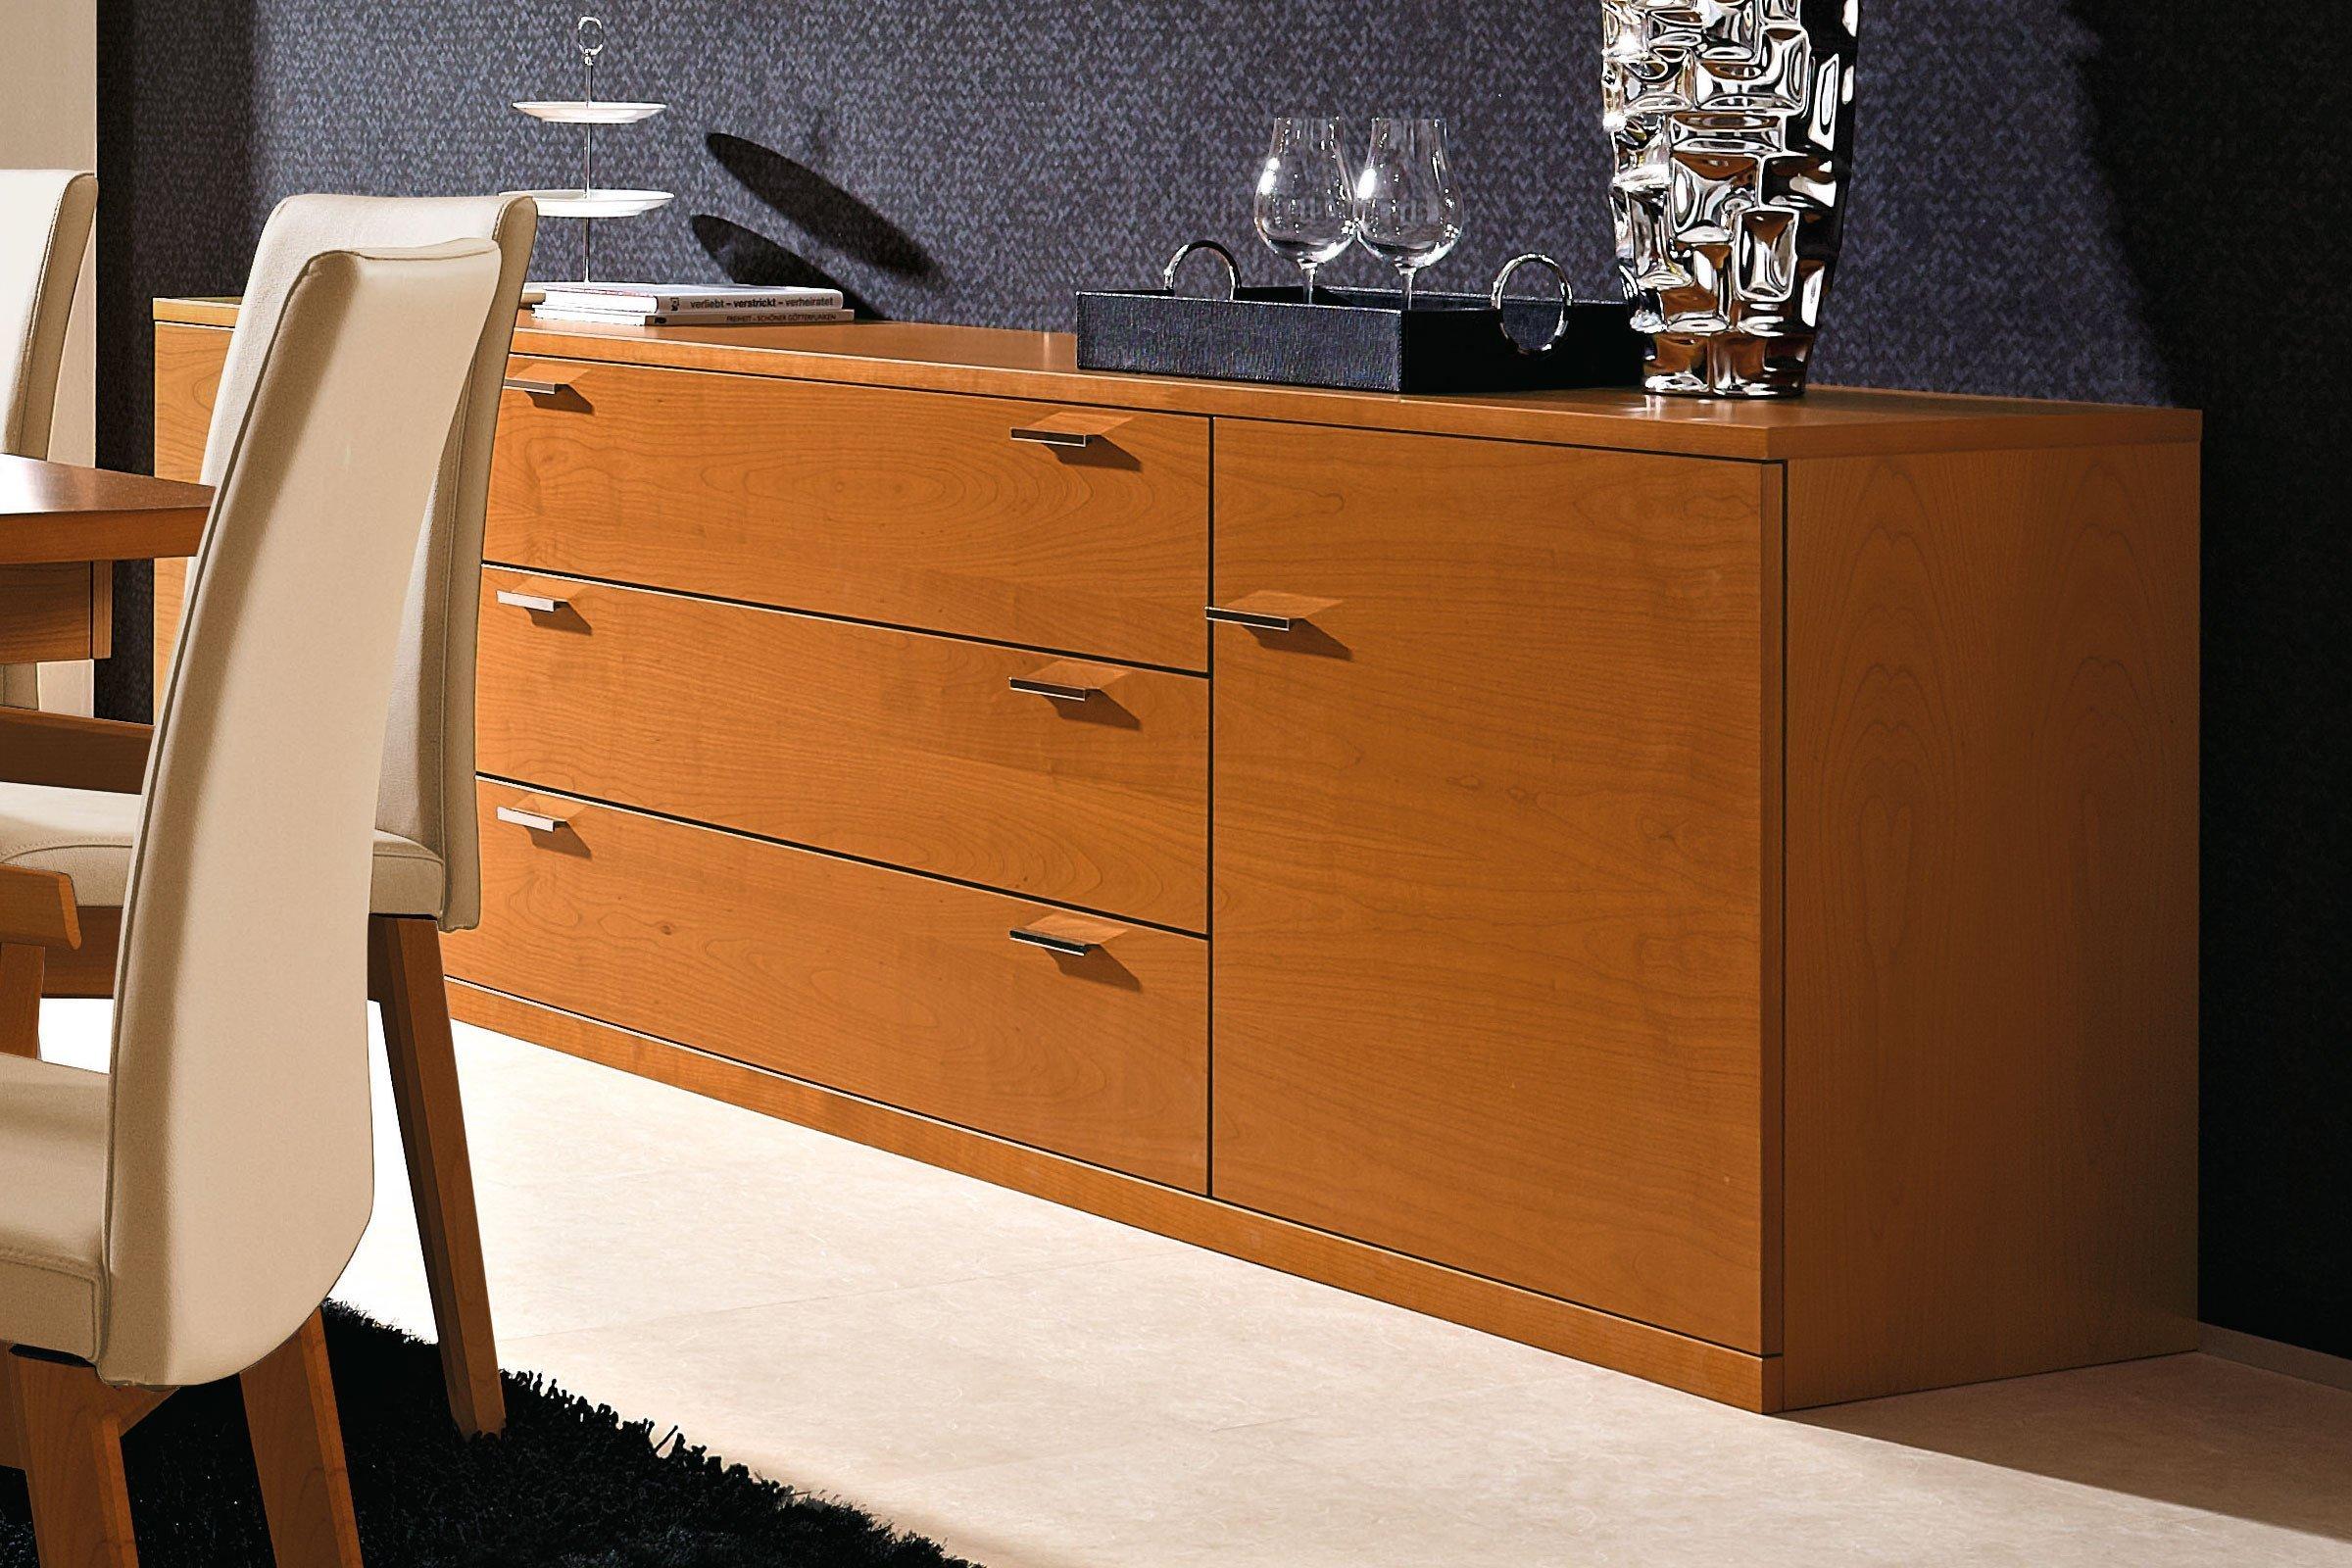 mieterh hung neues badezimmer. Black Bedroom Furniture Sets. Home Design Ideas